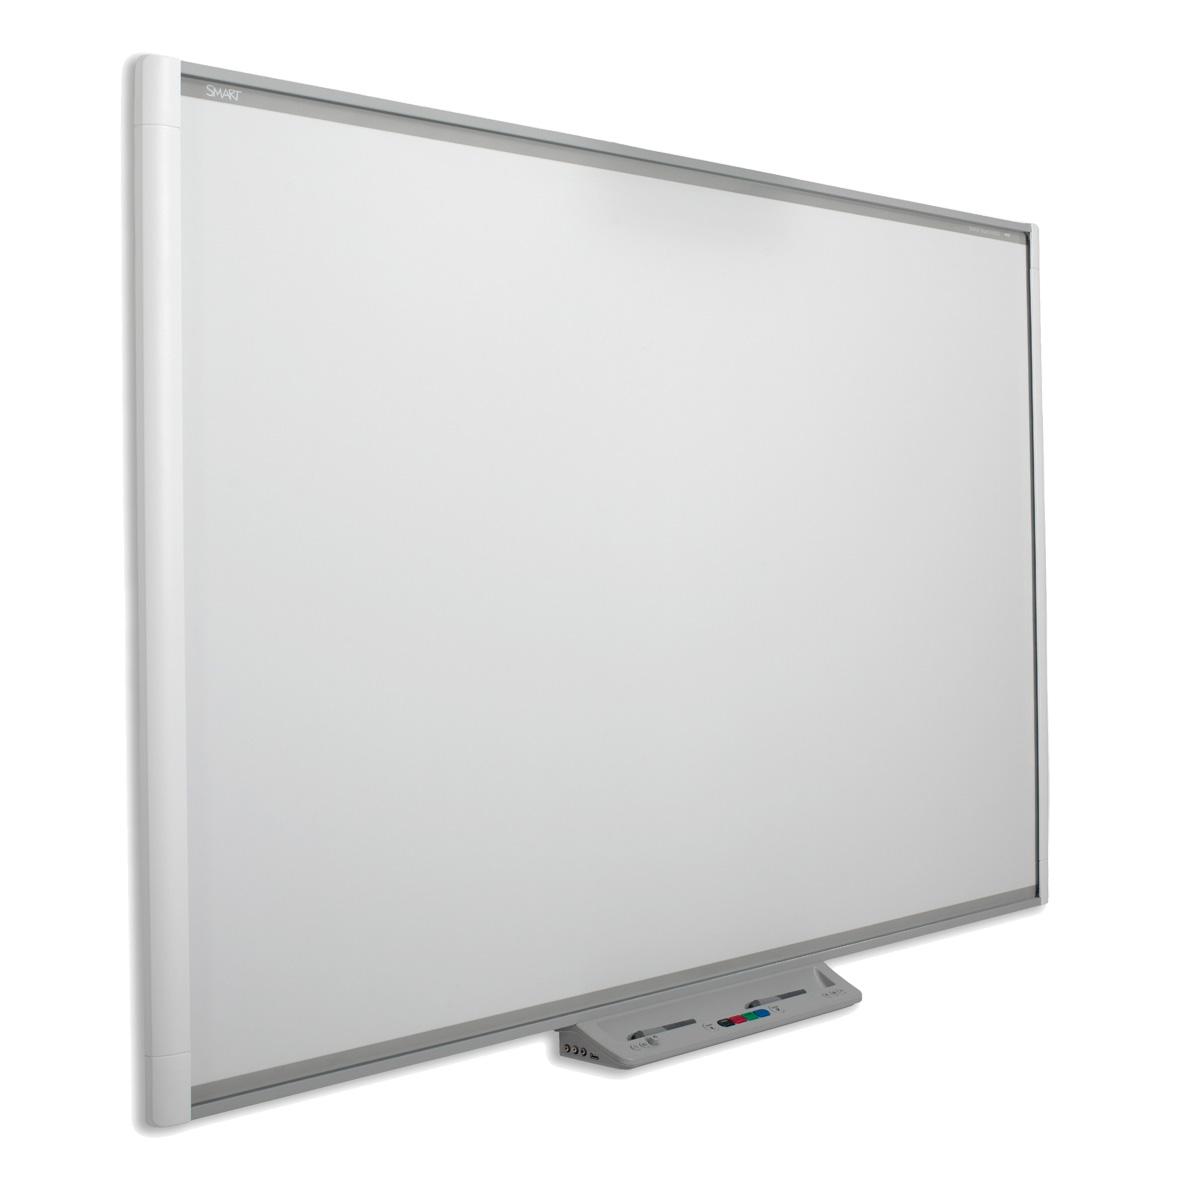 Bảng tương tác Smartview HVB- 9800I